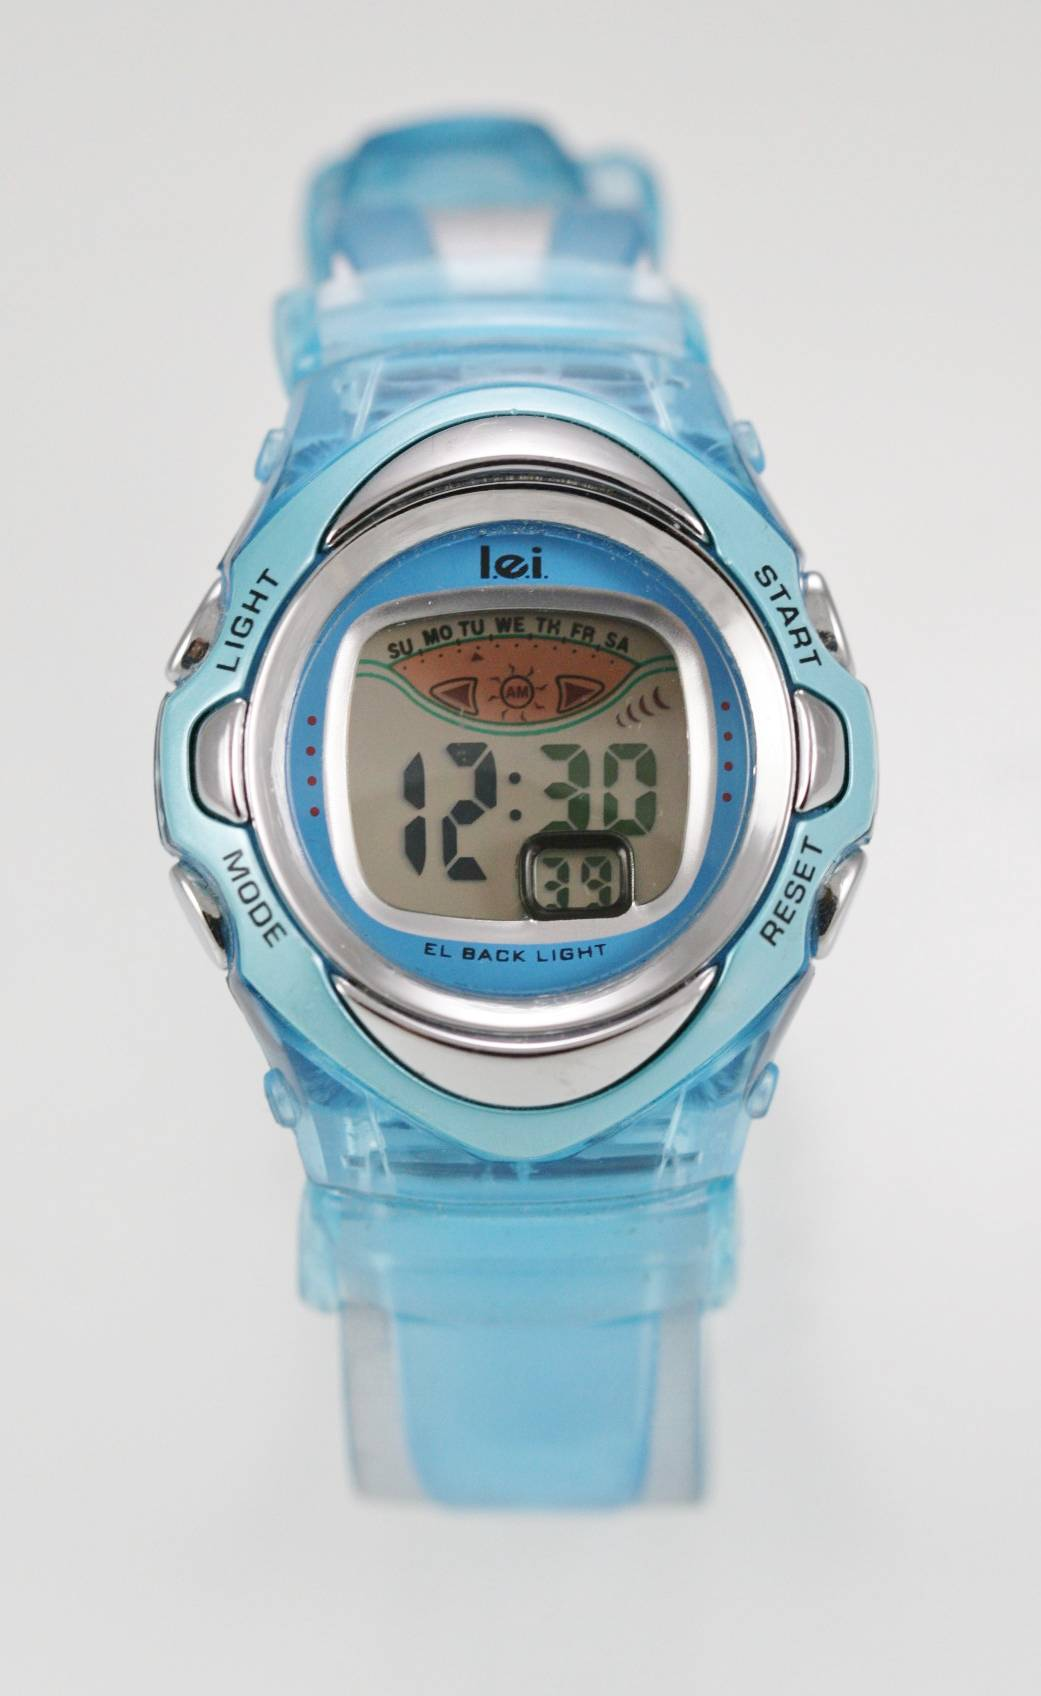 cc5534dca7f6 LEI reloj Unisex fecha alarma luz tope goma azul batería agua resisten  cuarzo